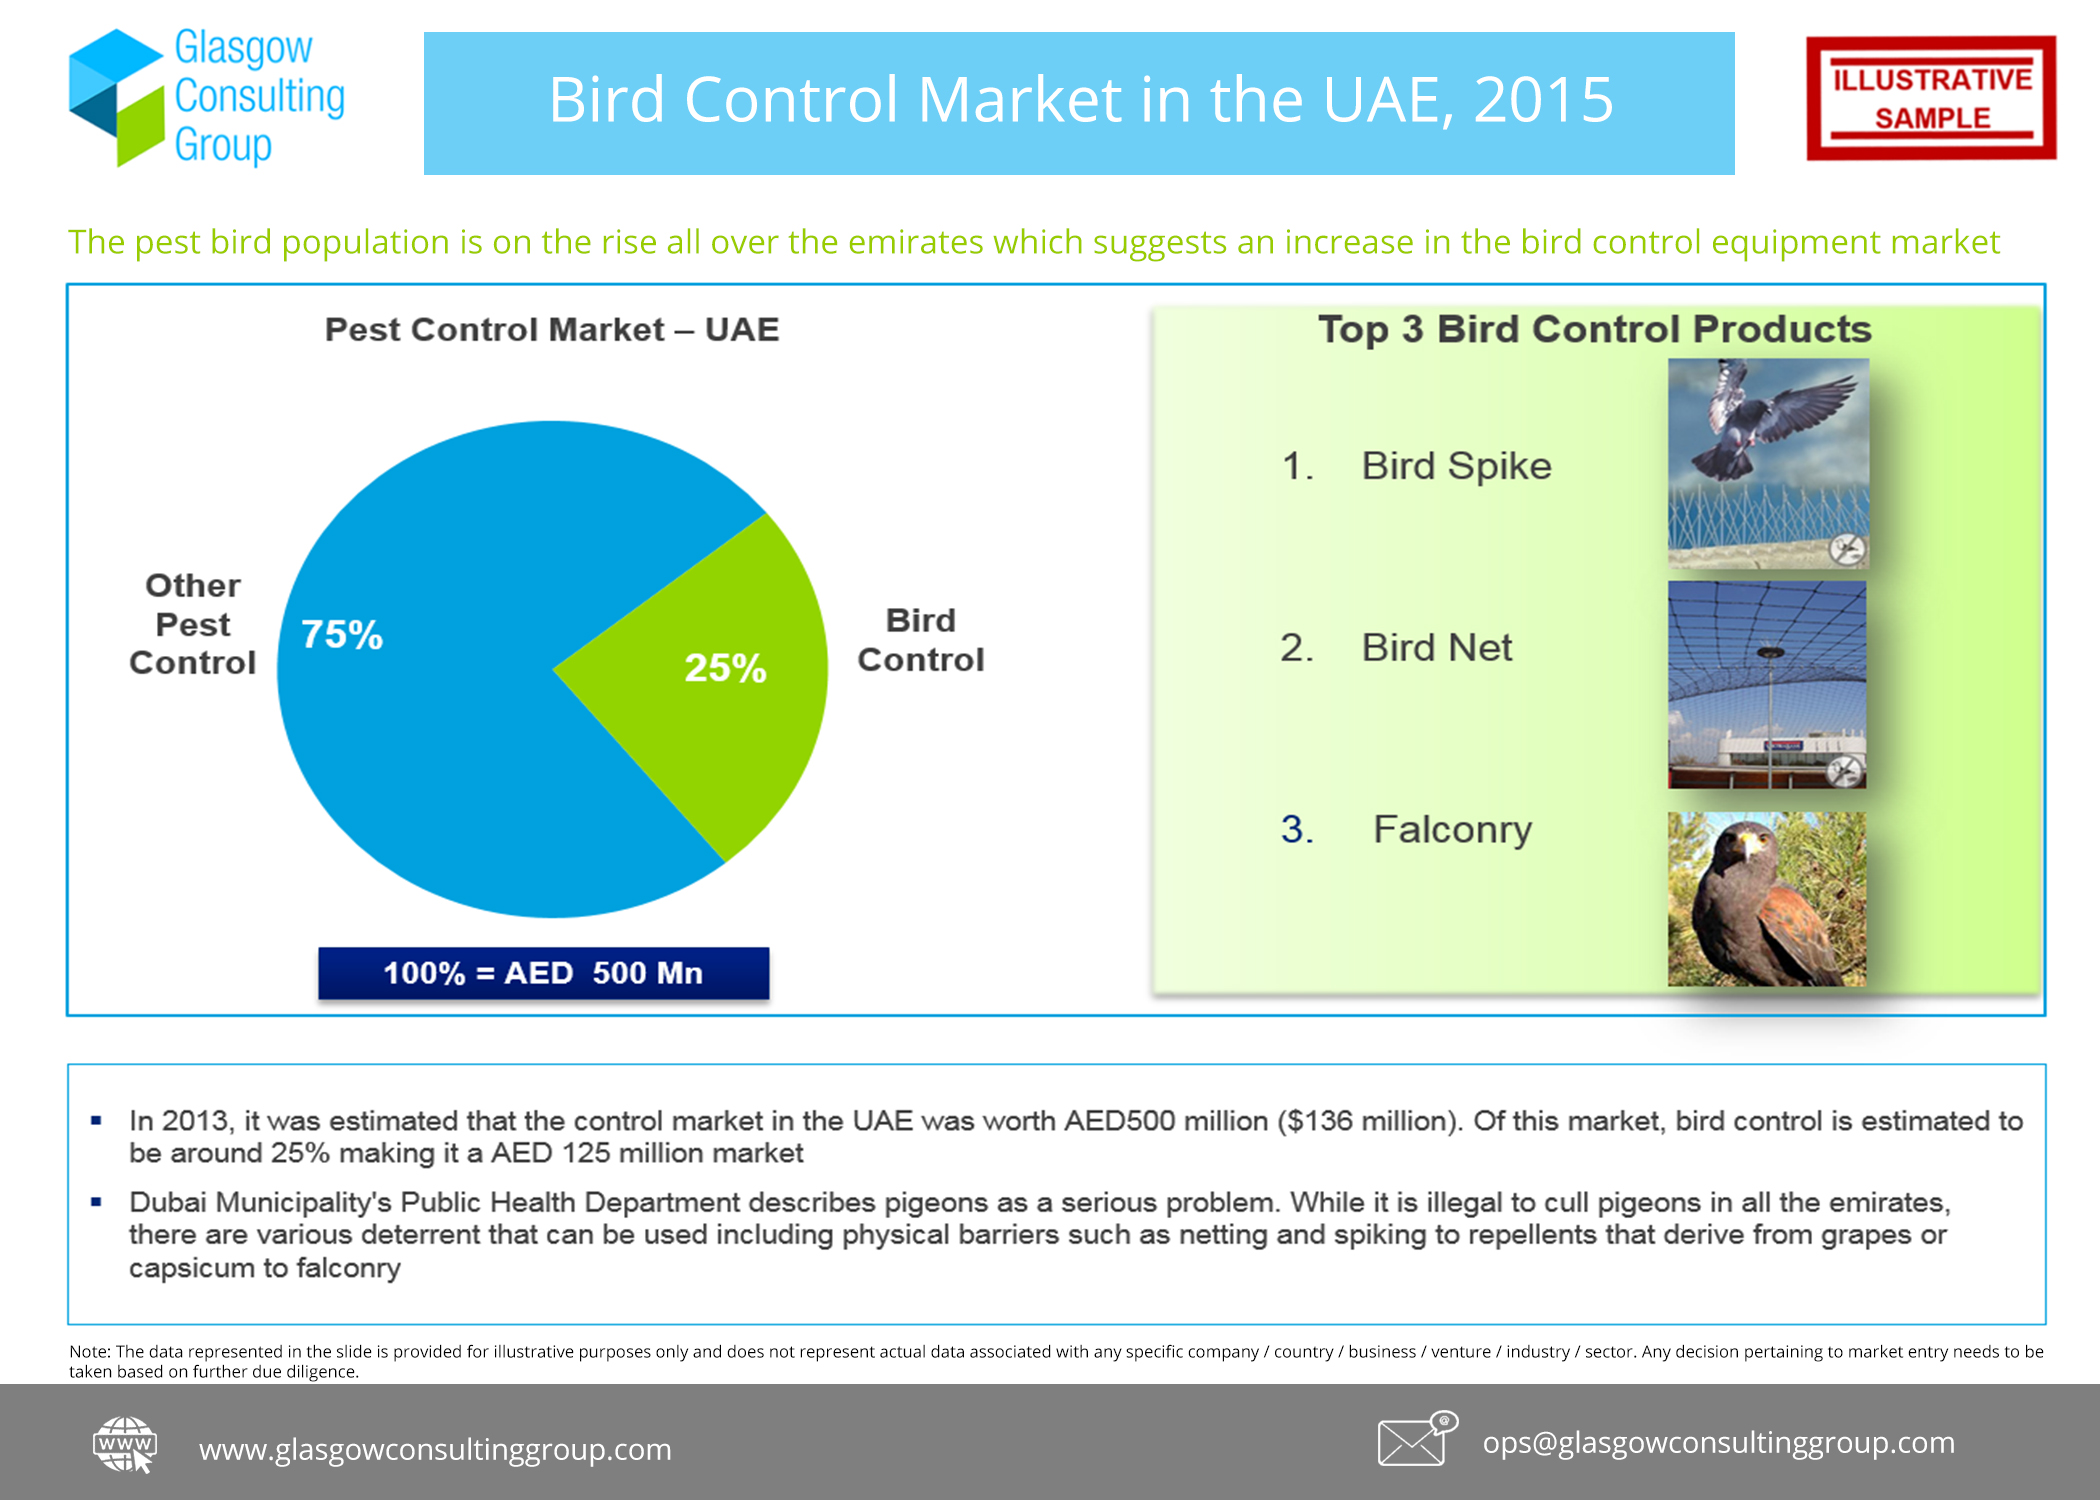 2 Bird Control Market in the UAE, 2015